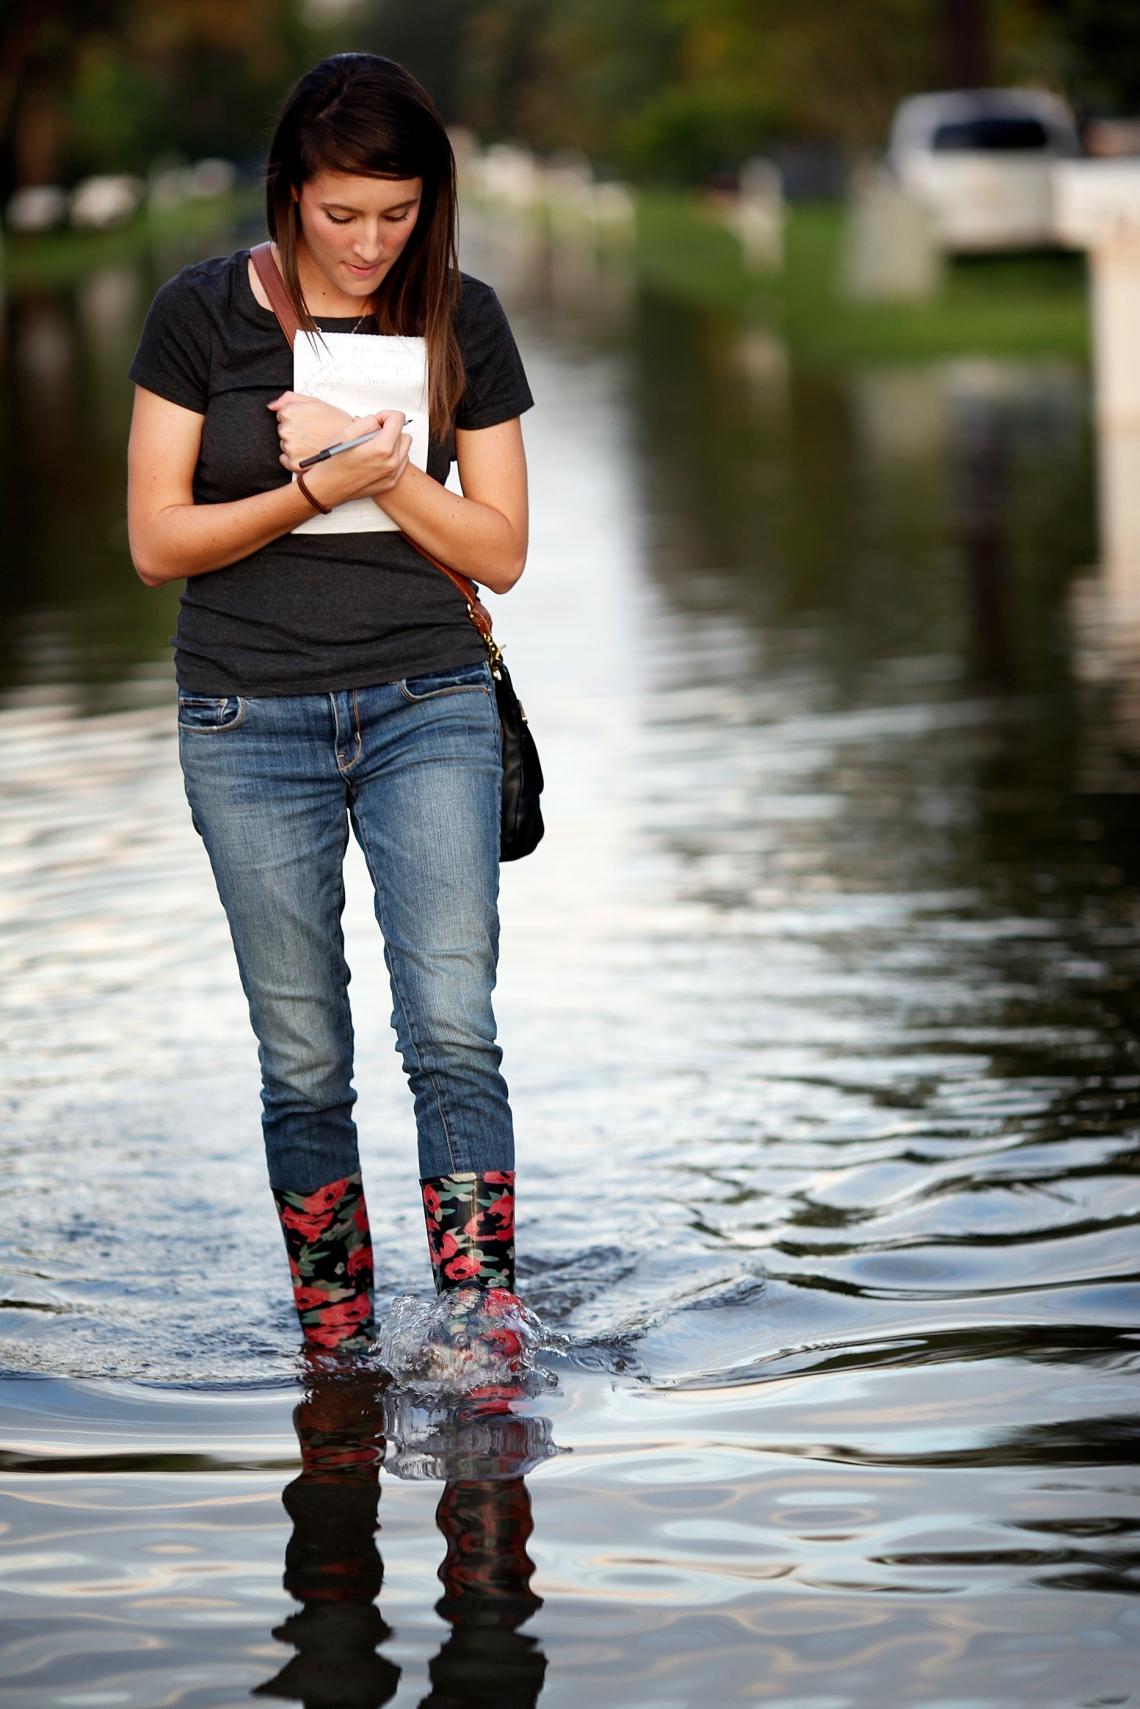 Reporting on rain